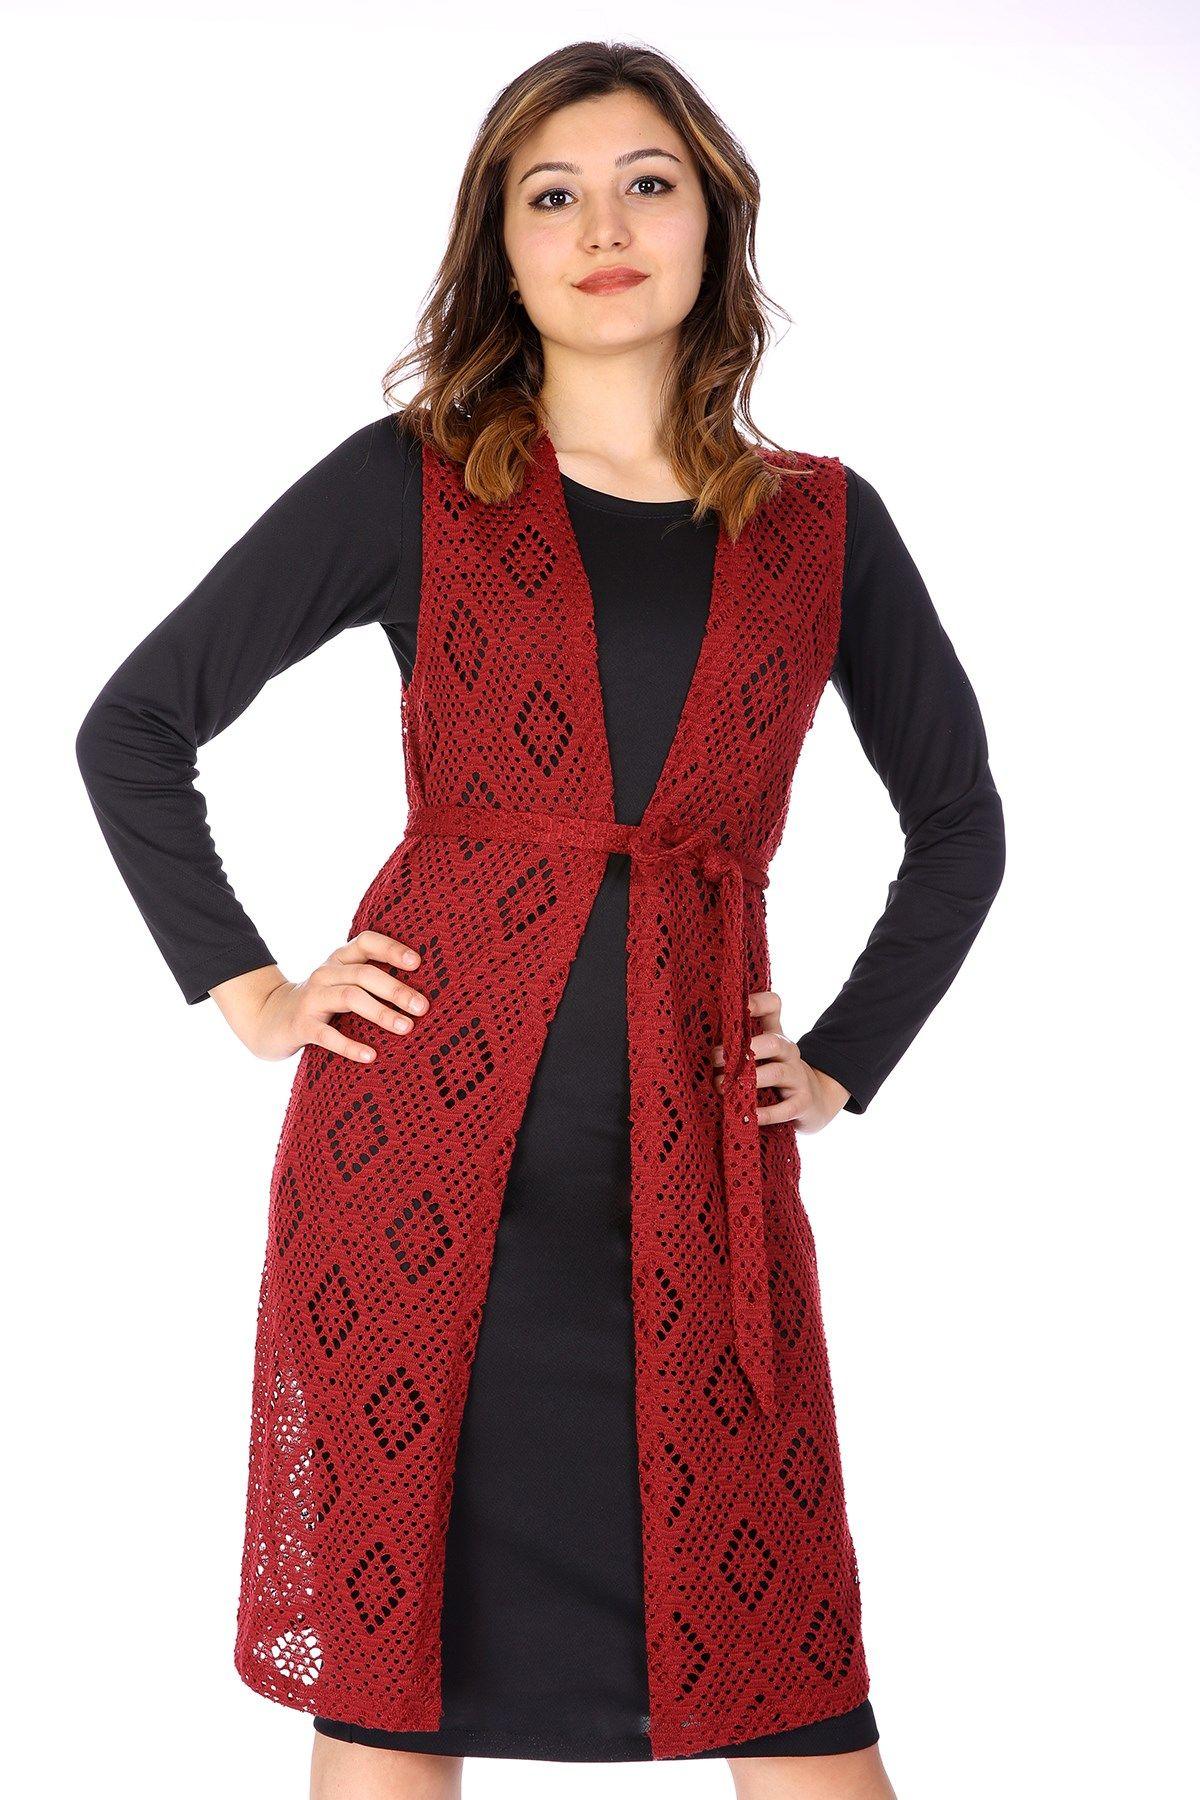 Vests-Claret Red